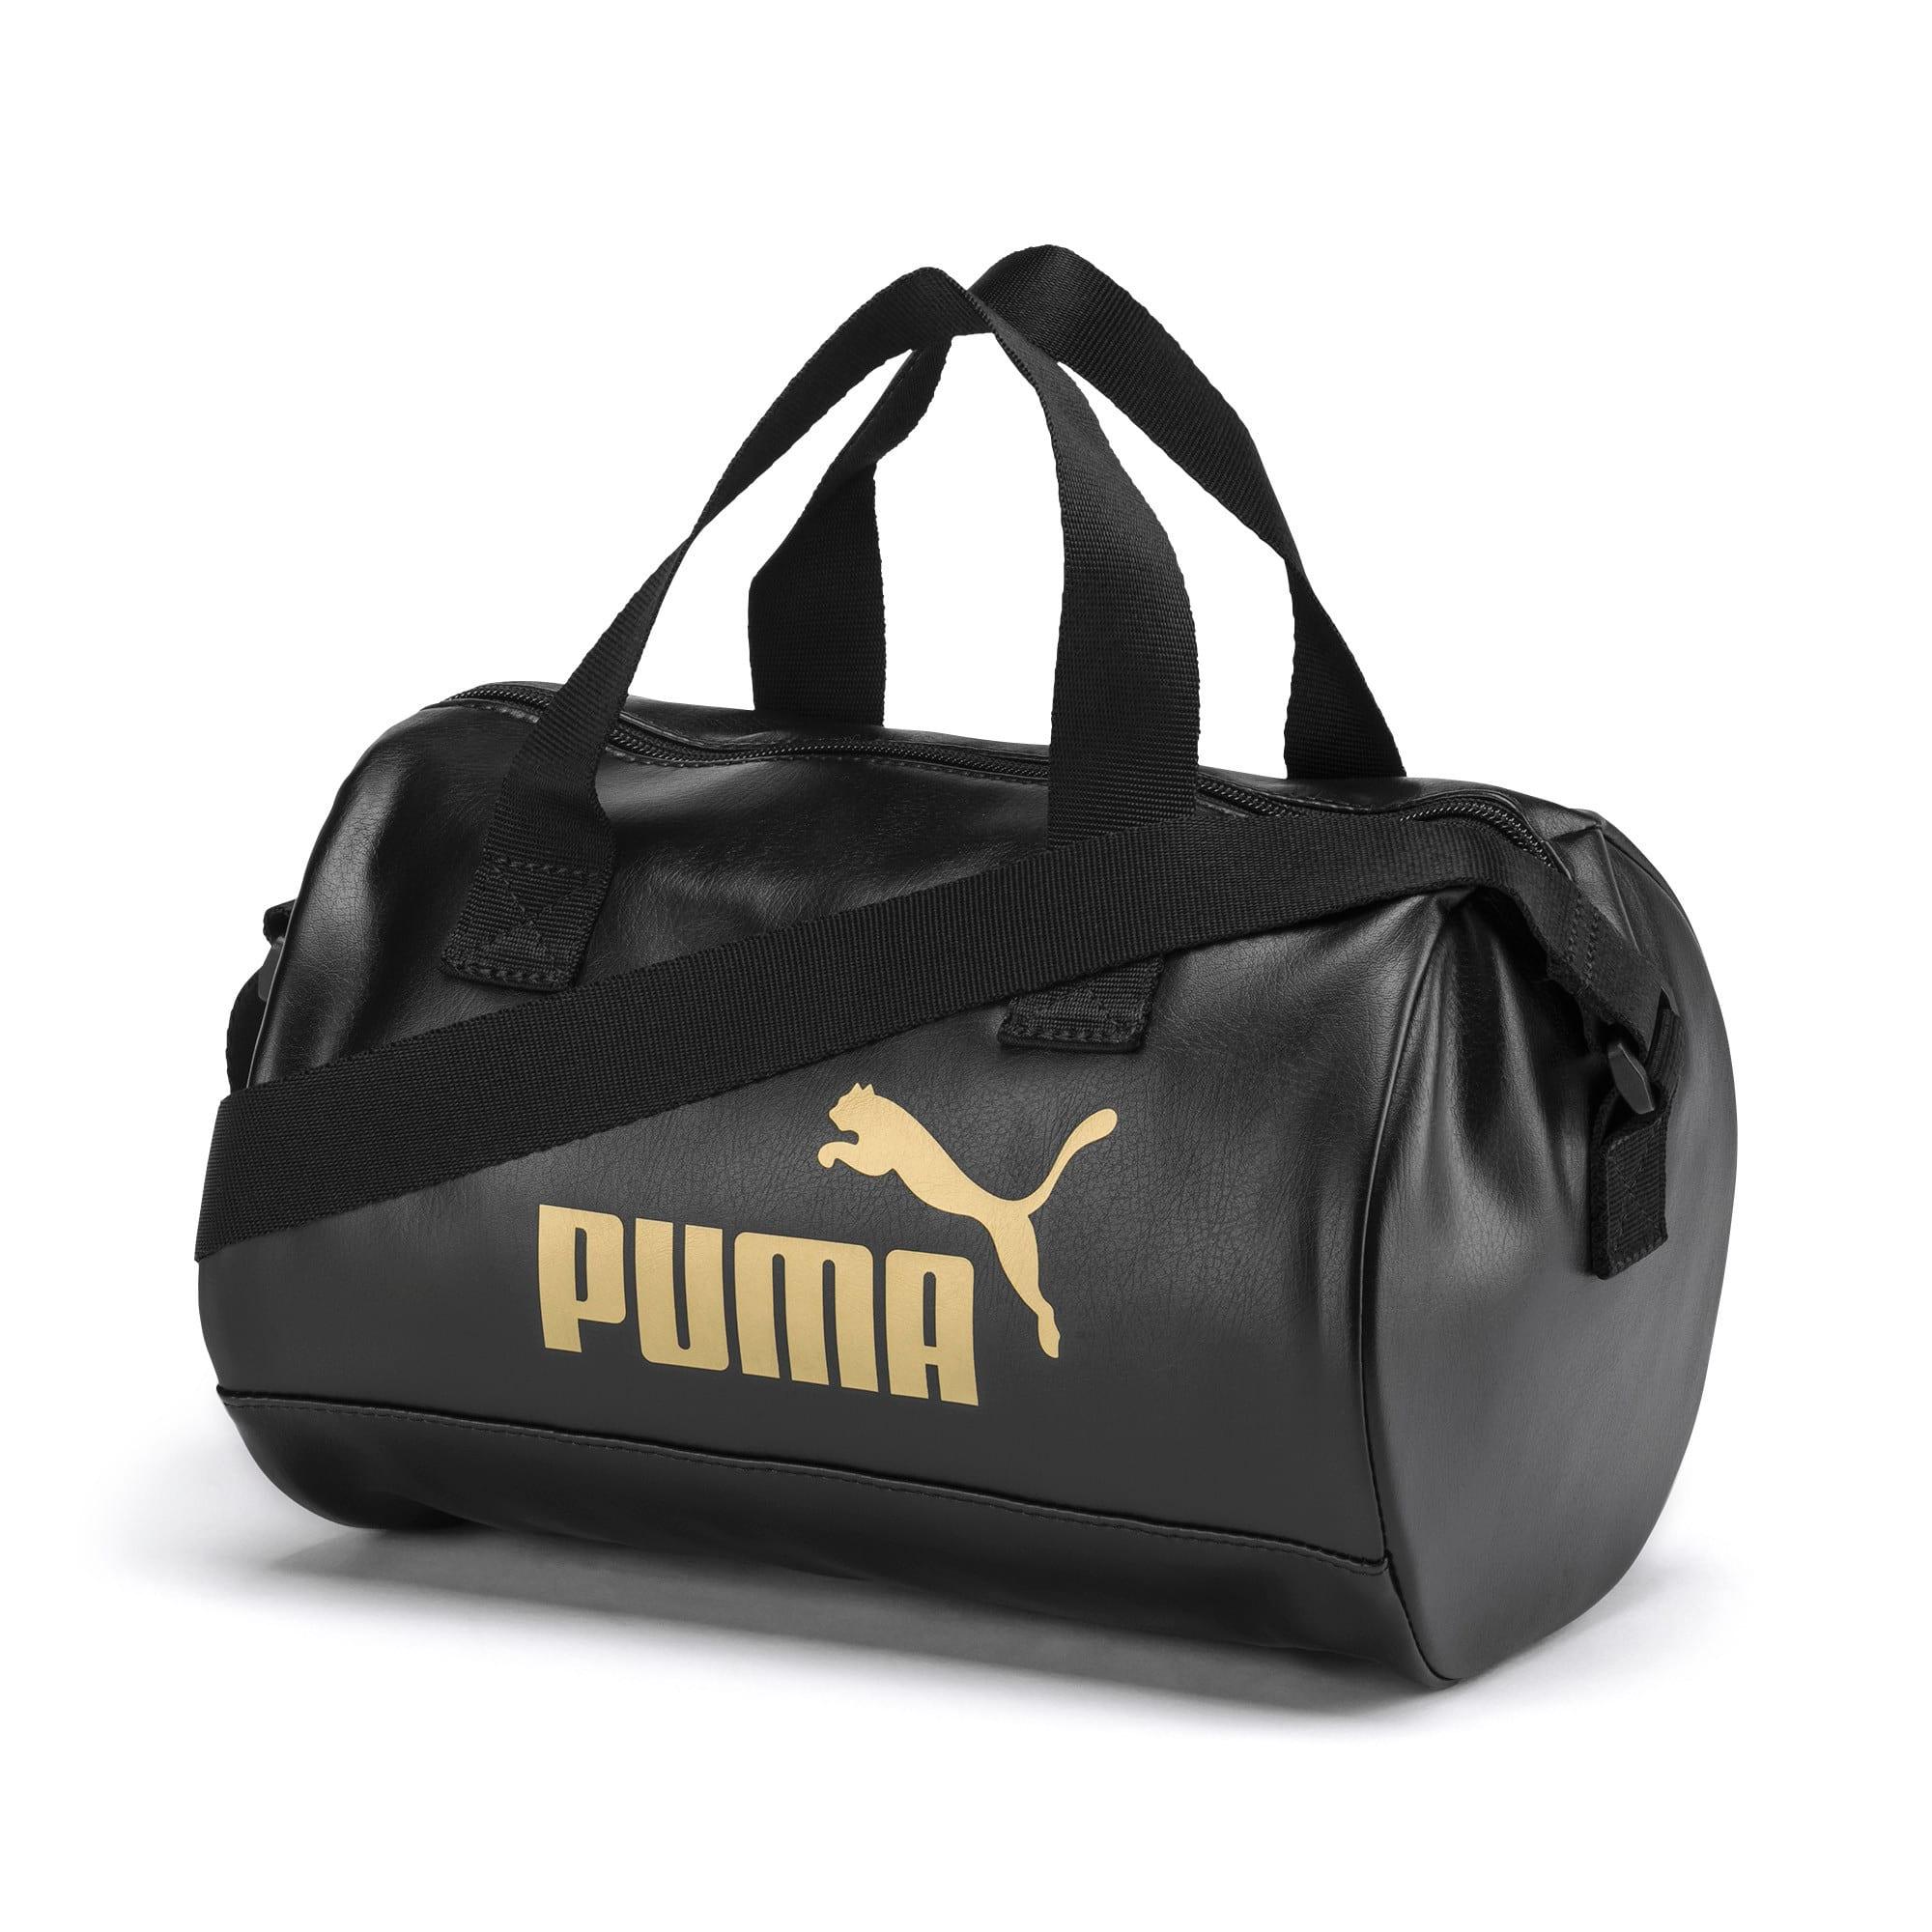 Thumbnail 1 of Up Women's Handbag, Puma Black-Gold, medium-IND